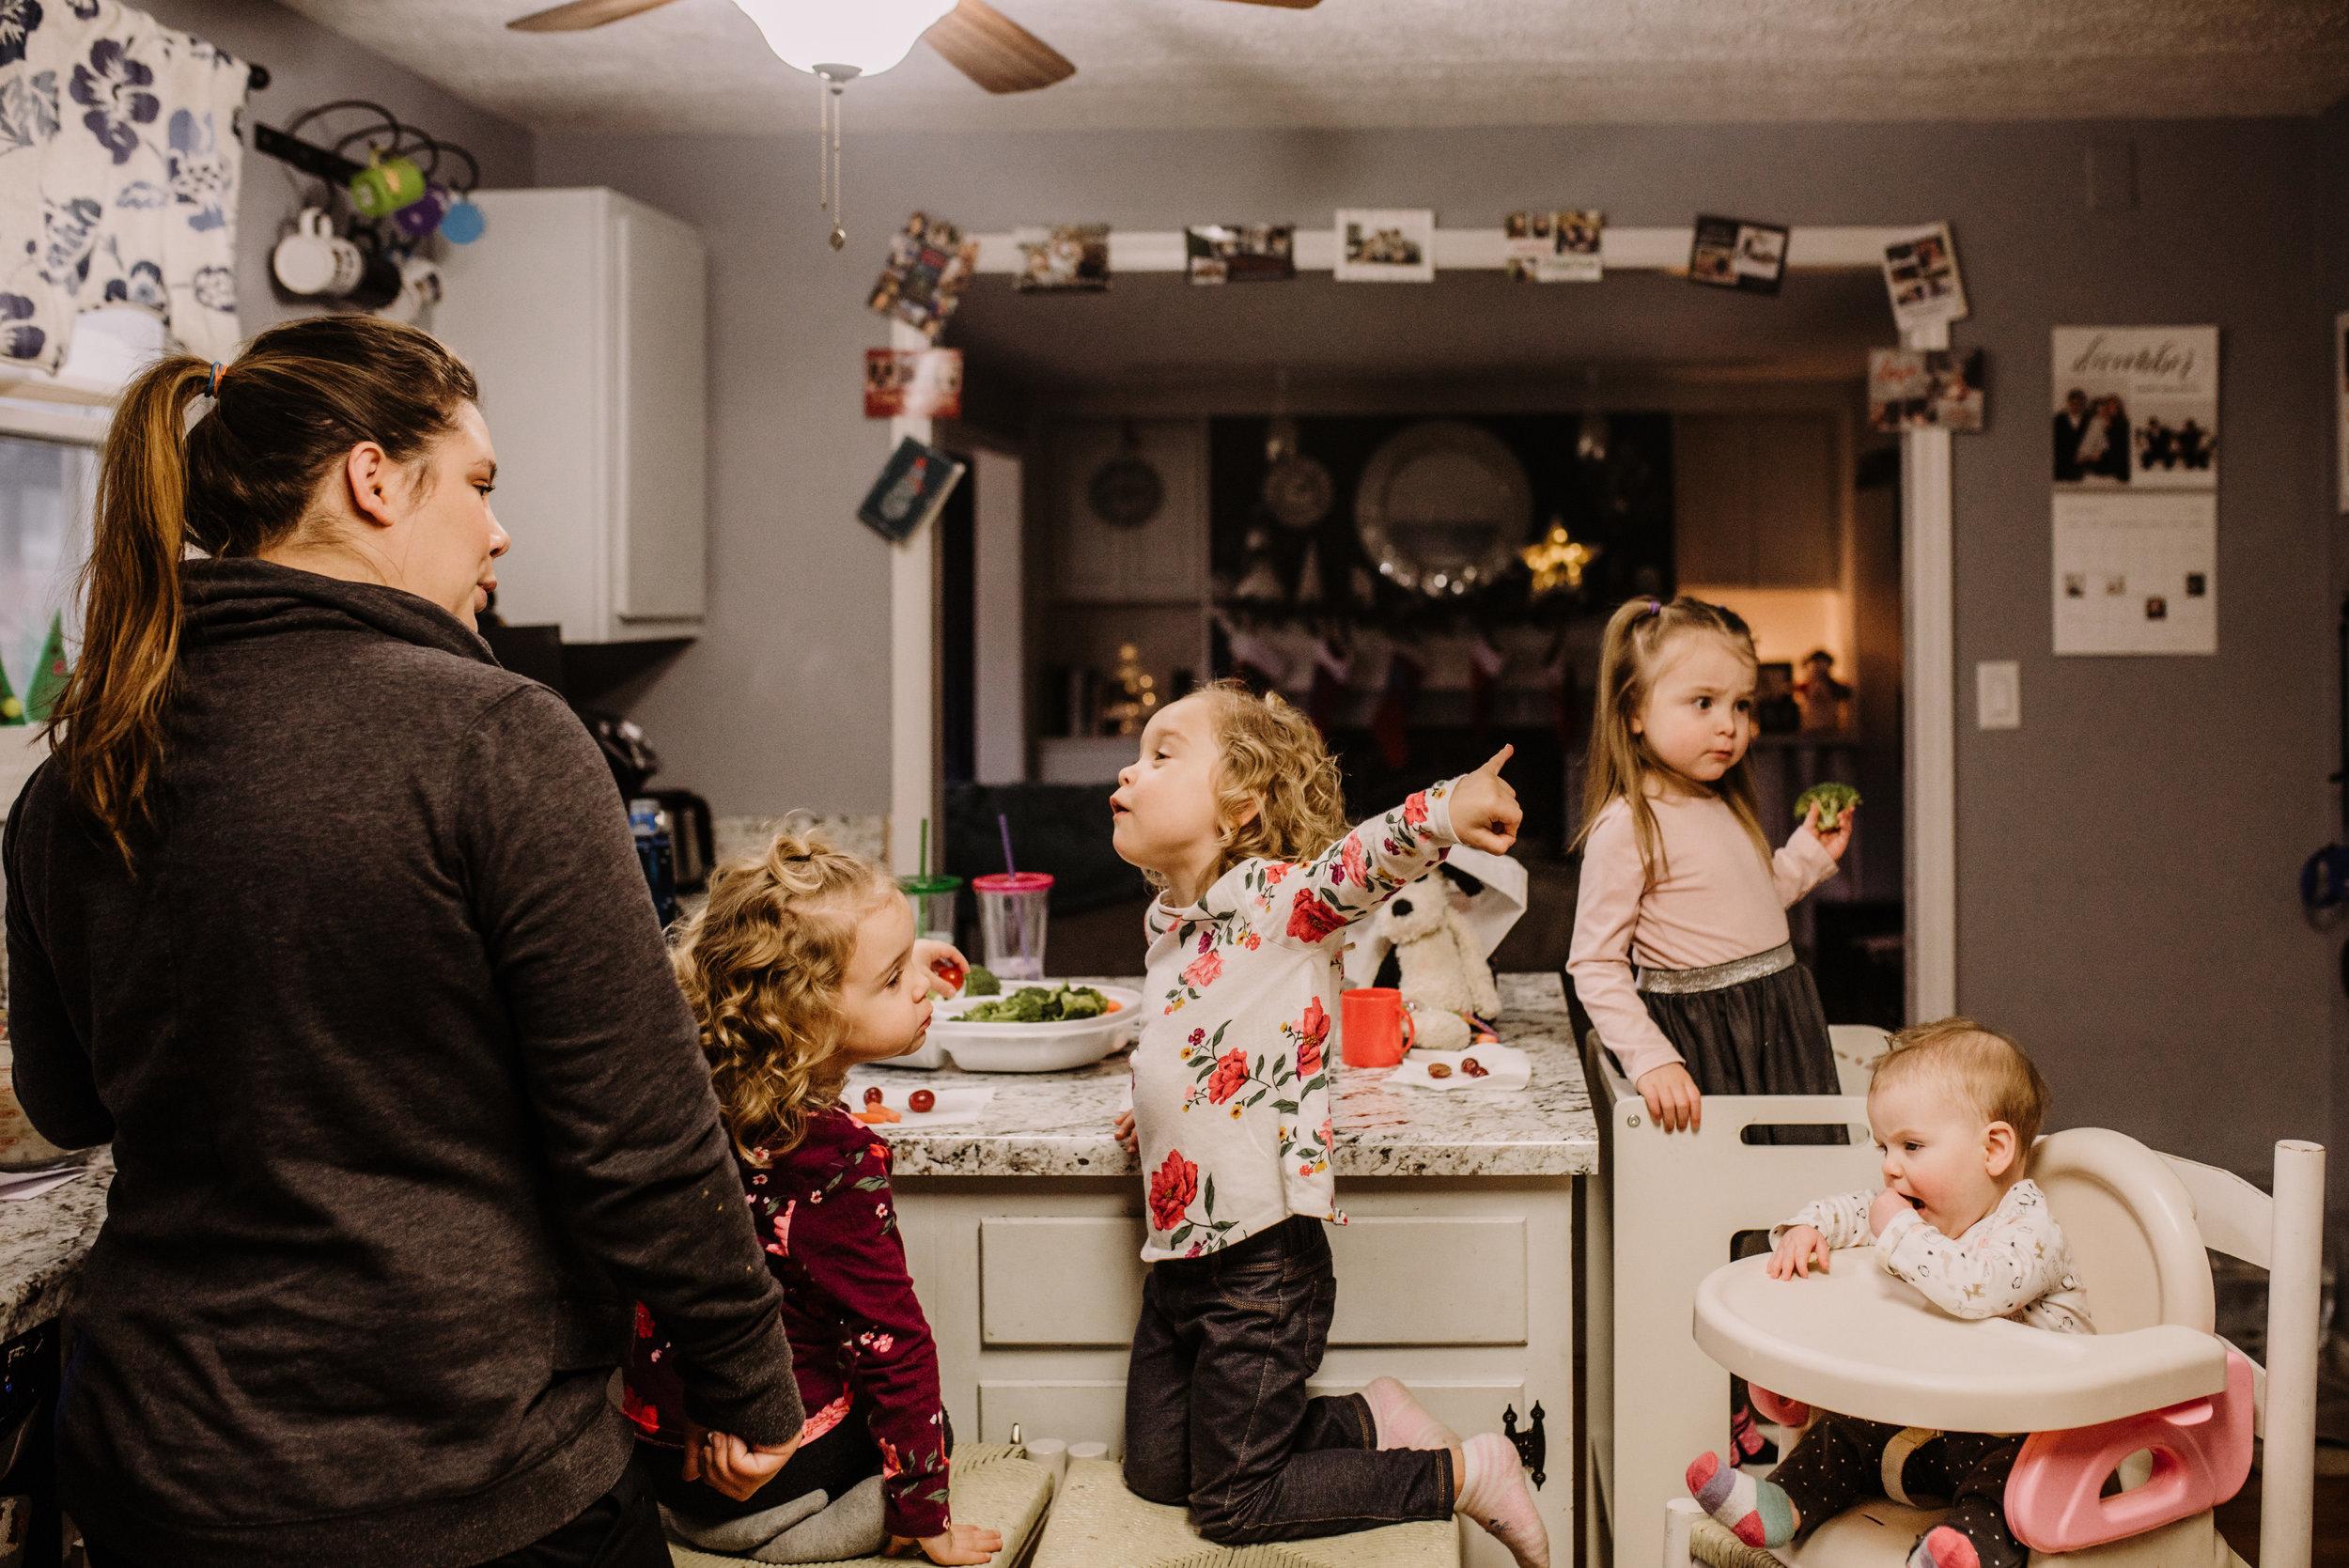 Family Gathering / Holiday Feast - Family V Slice of Life Documentary Session